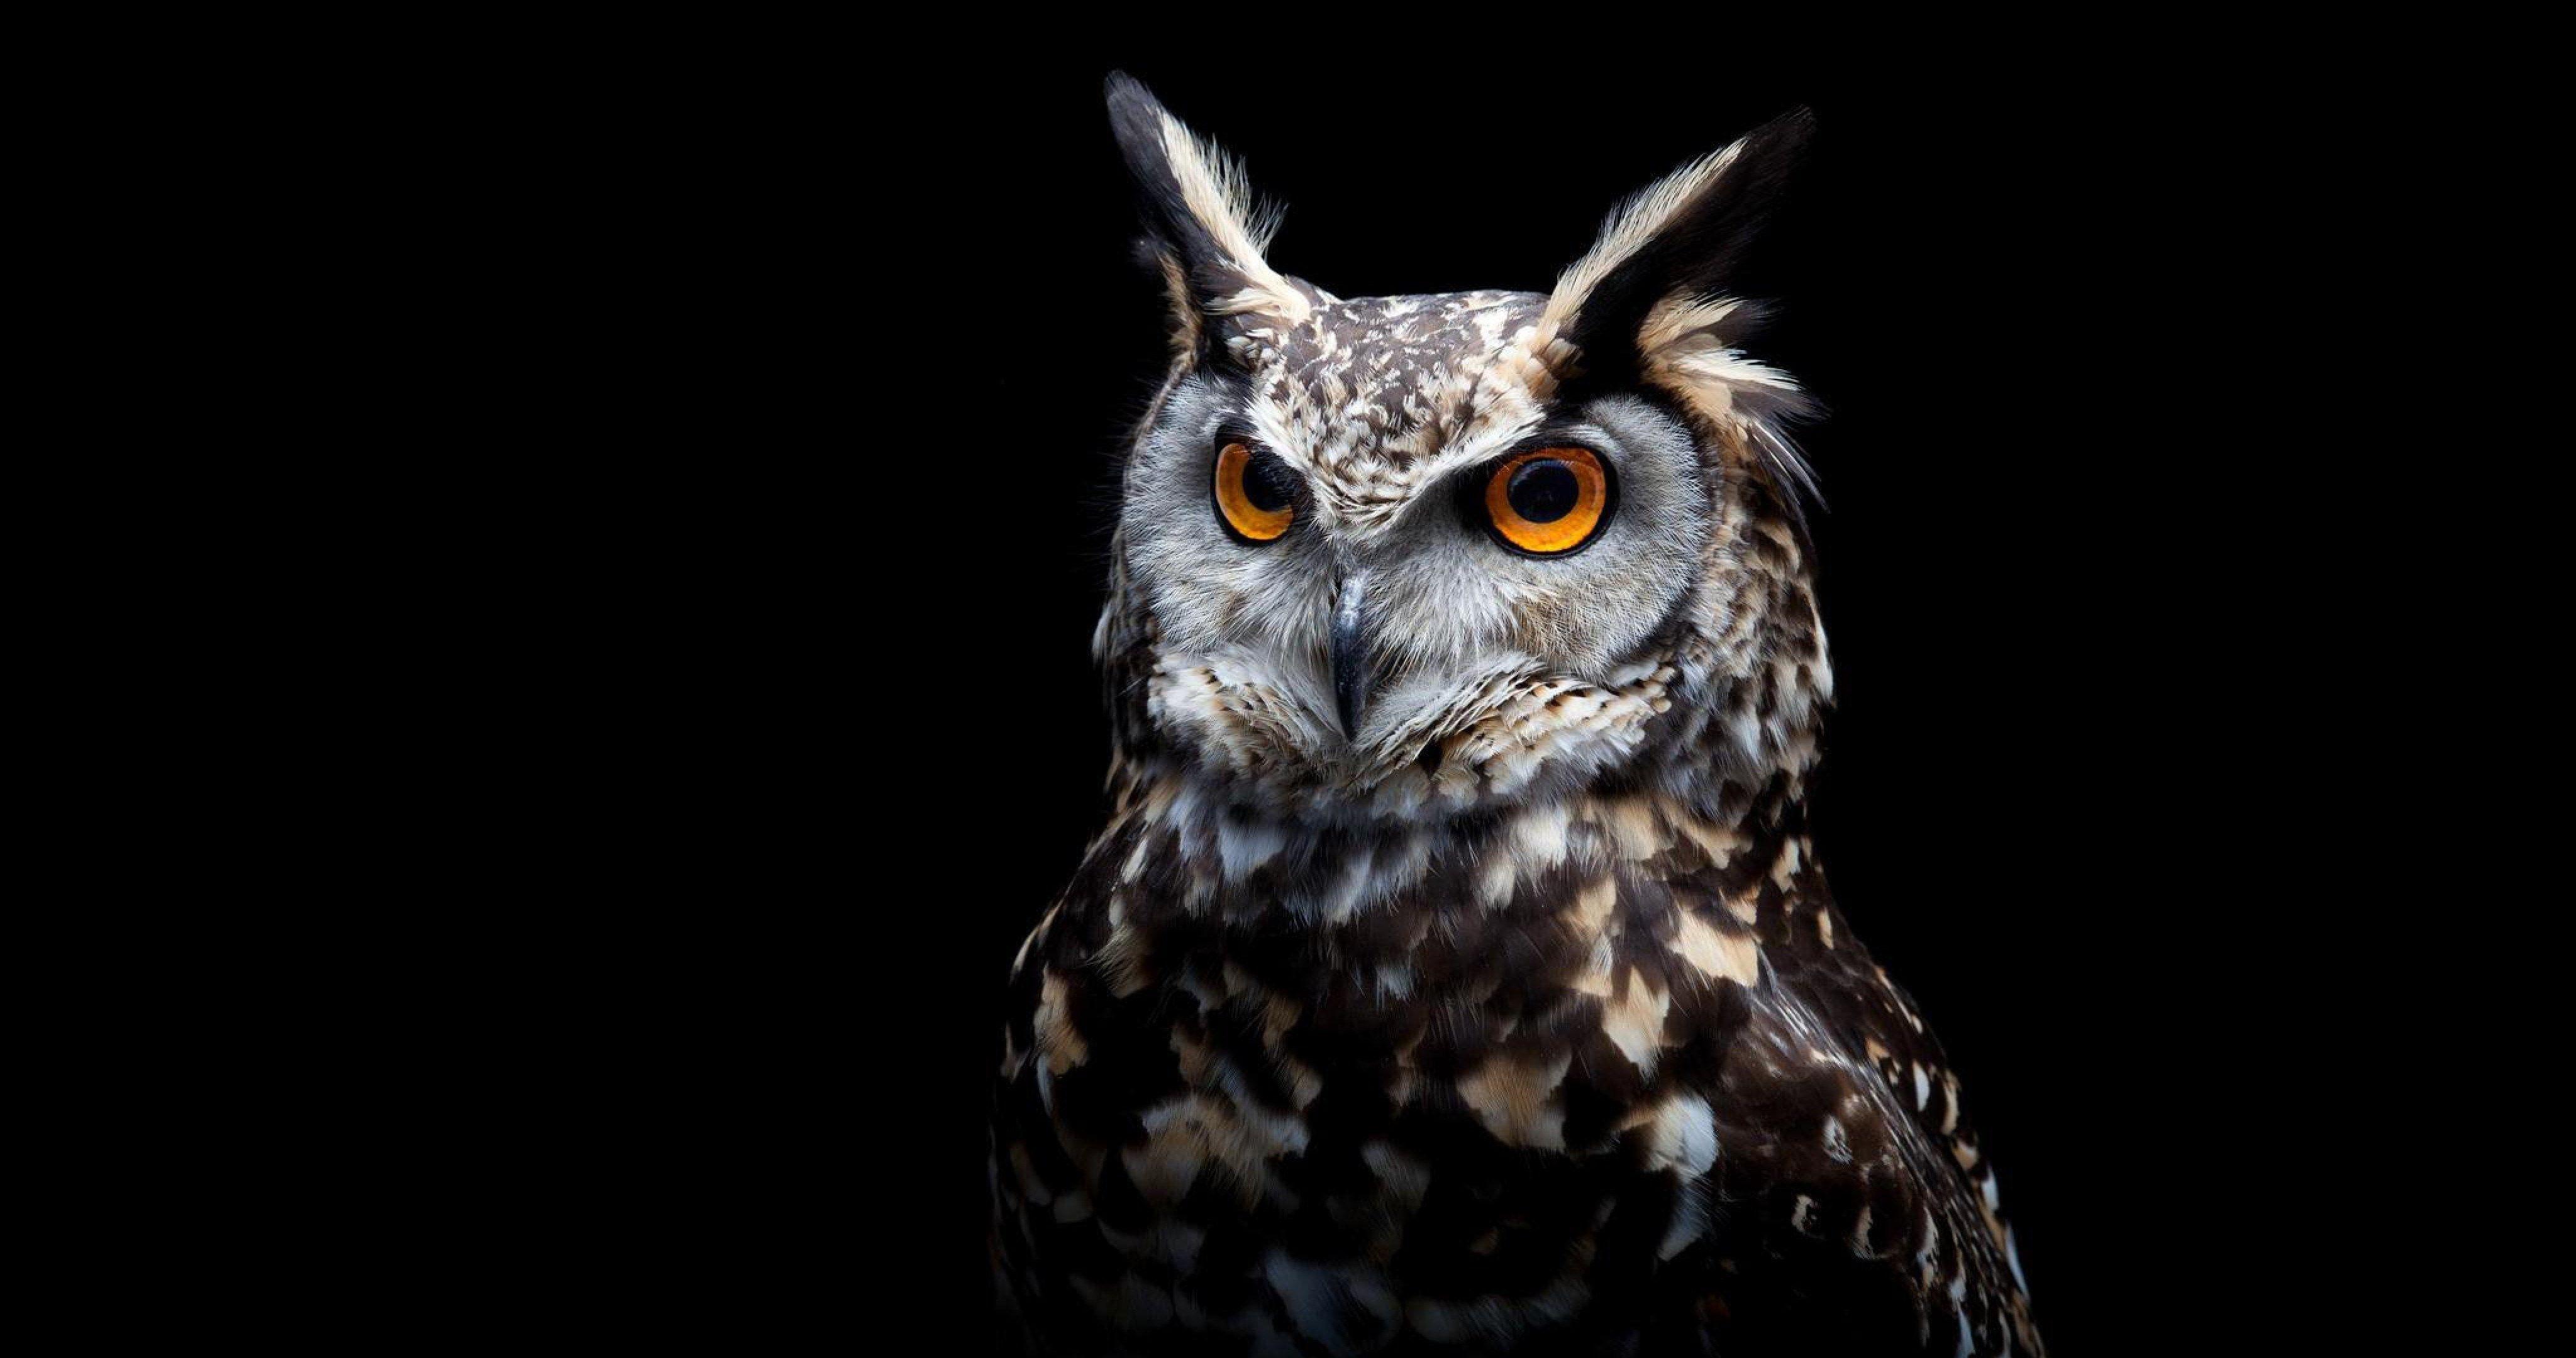 Owl Eyes Black Background 4096x2160 Download Hd Wallpaper Wallpapertip